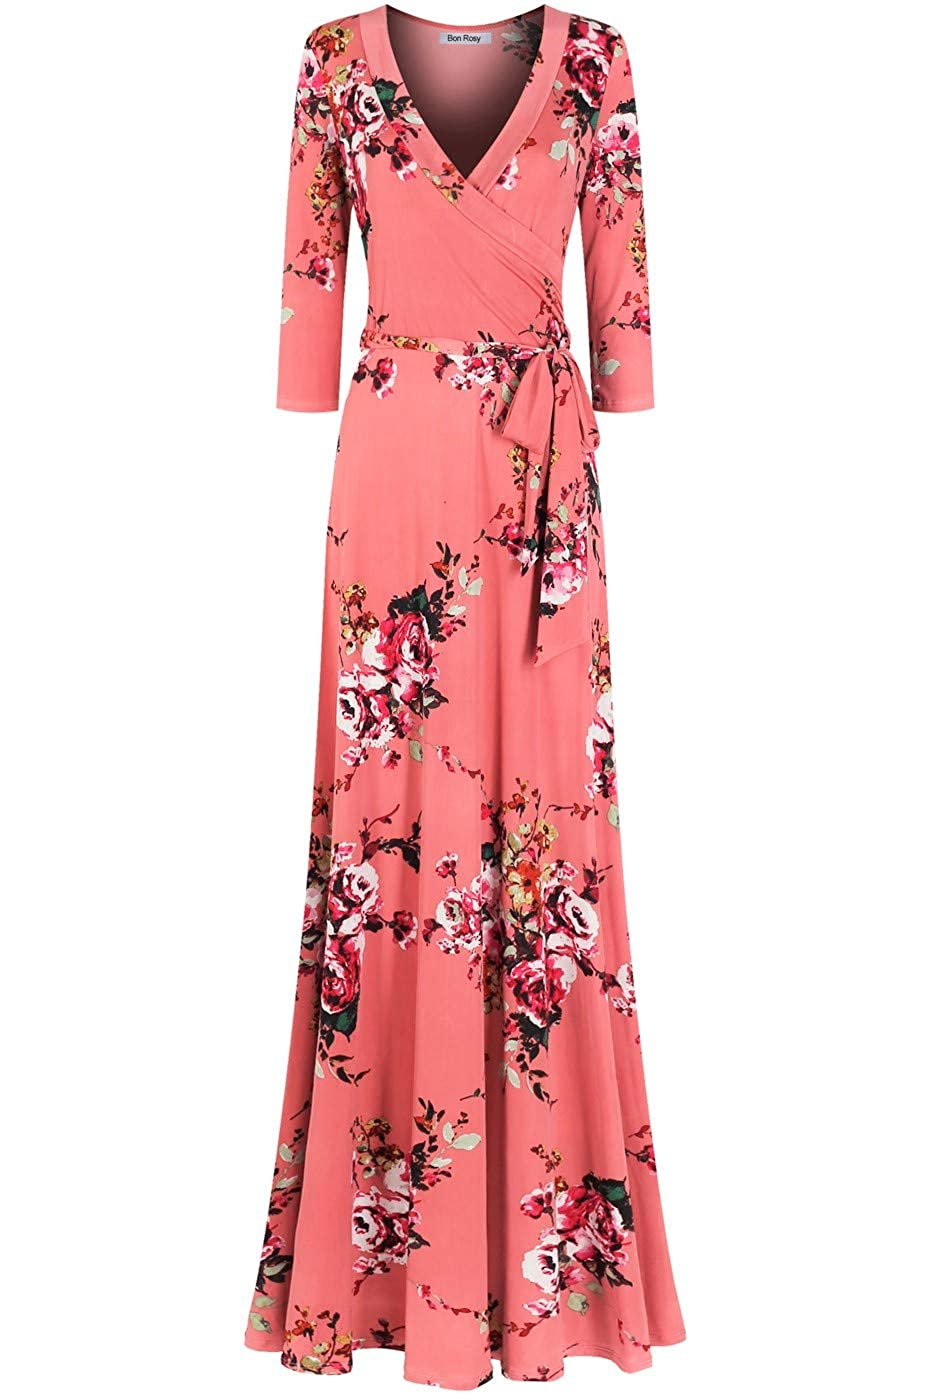 bluesh Flora Bon Rosy Women's Long Sleeve VNeck Floral Maxi Bohemian Wrap Dress